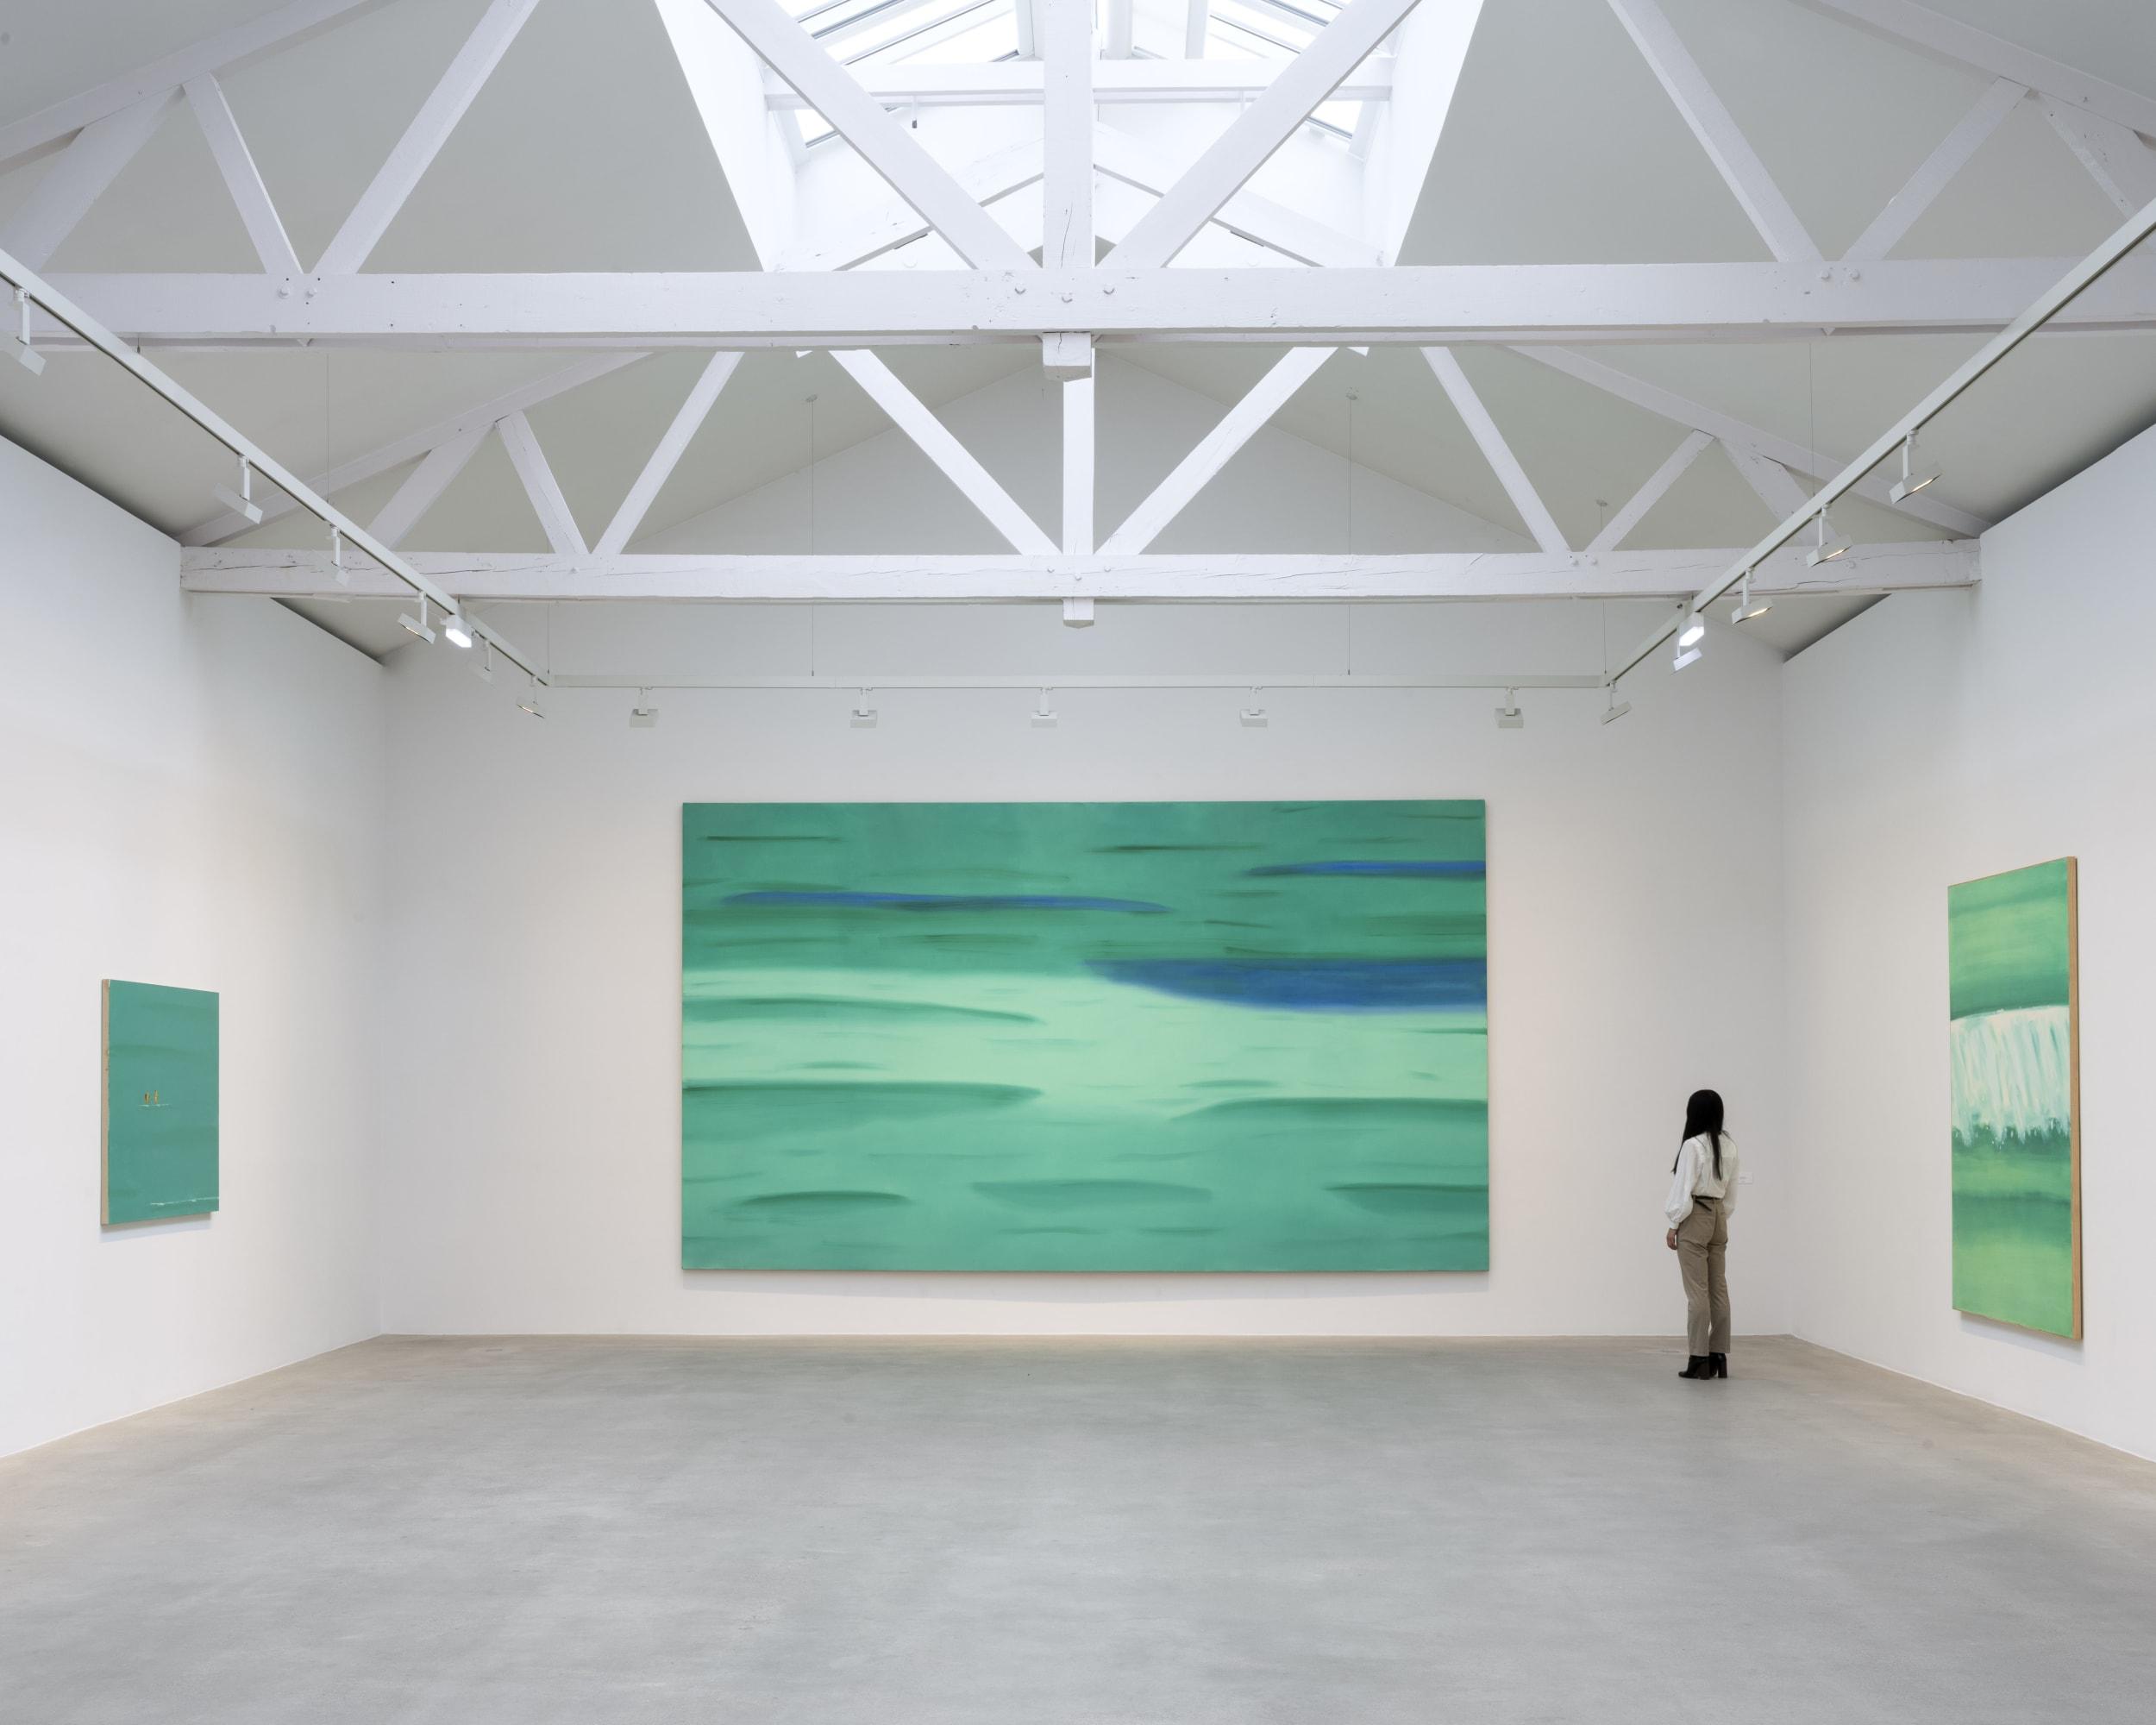 Alex Katz Mondes flottants Floating Worlds curated by Éric de Chassey